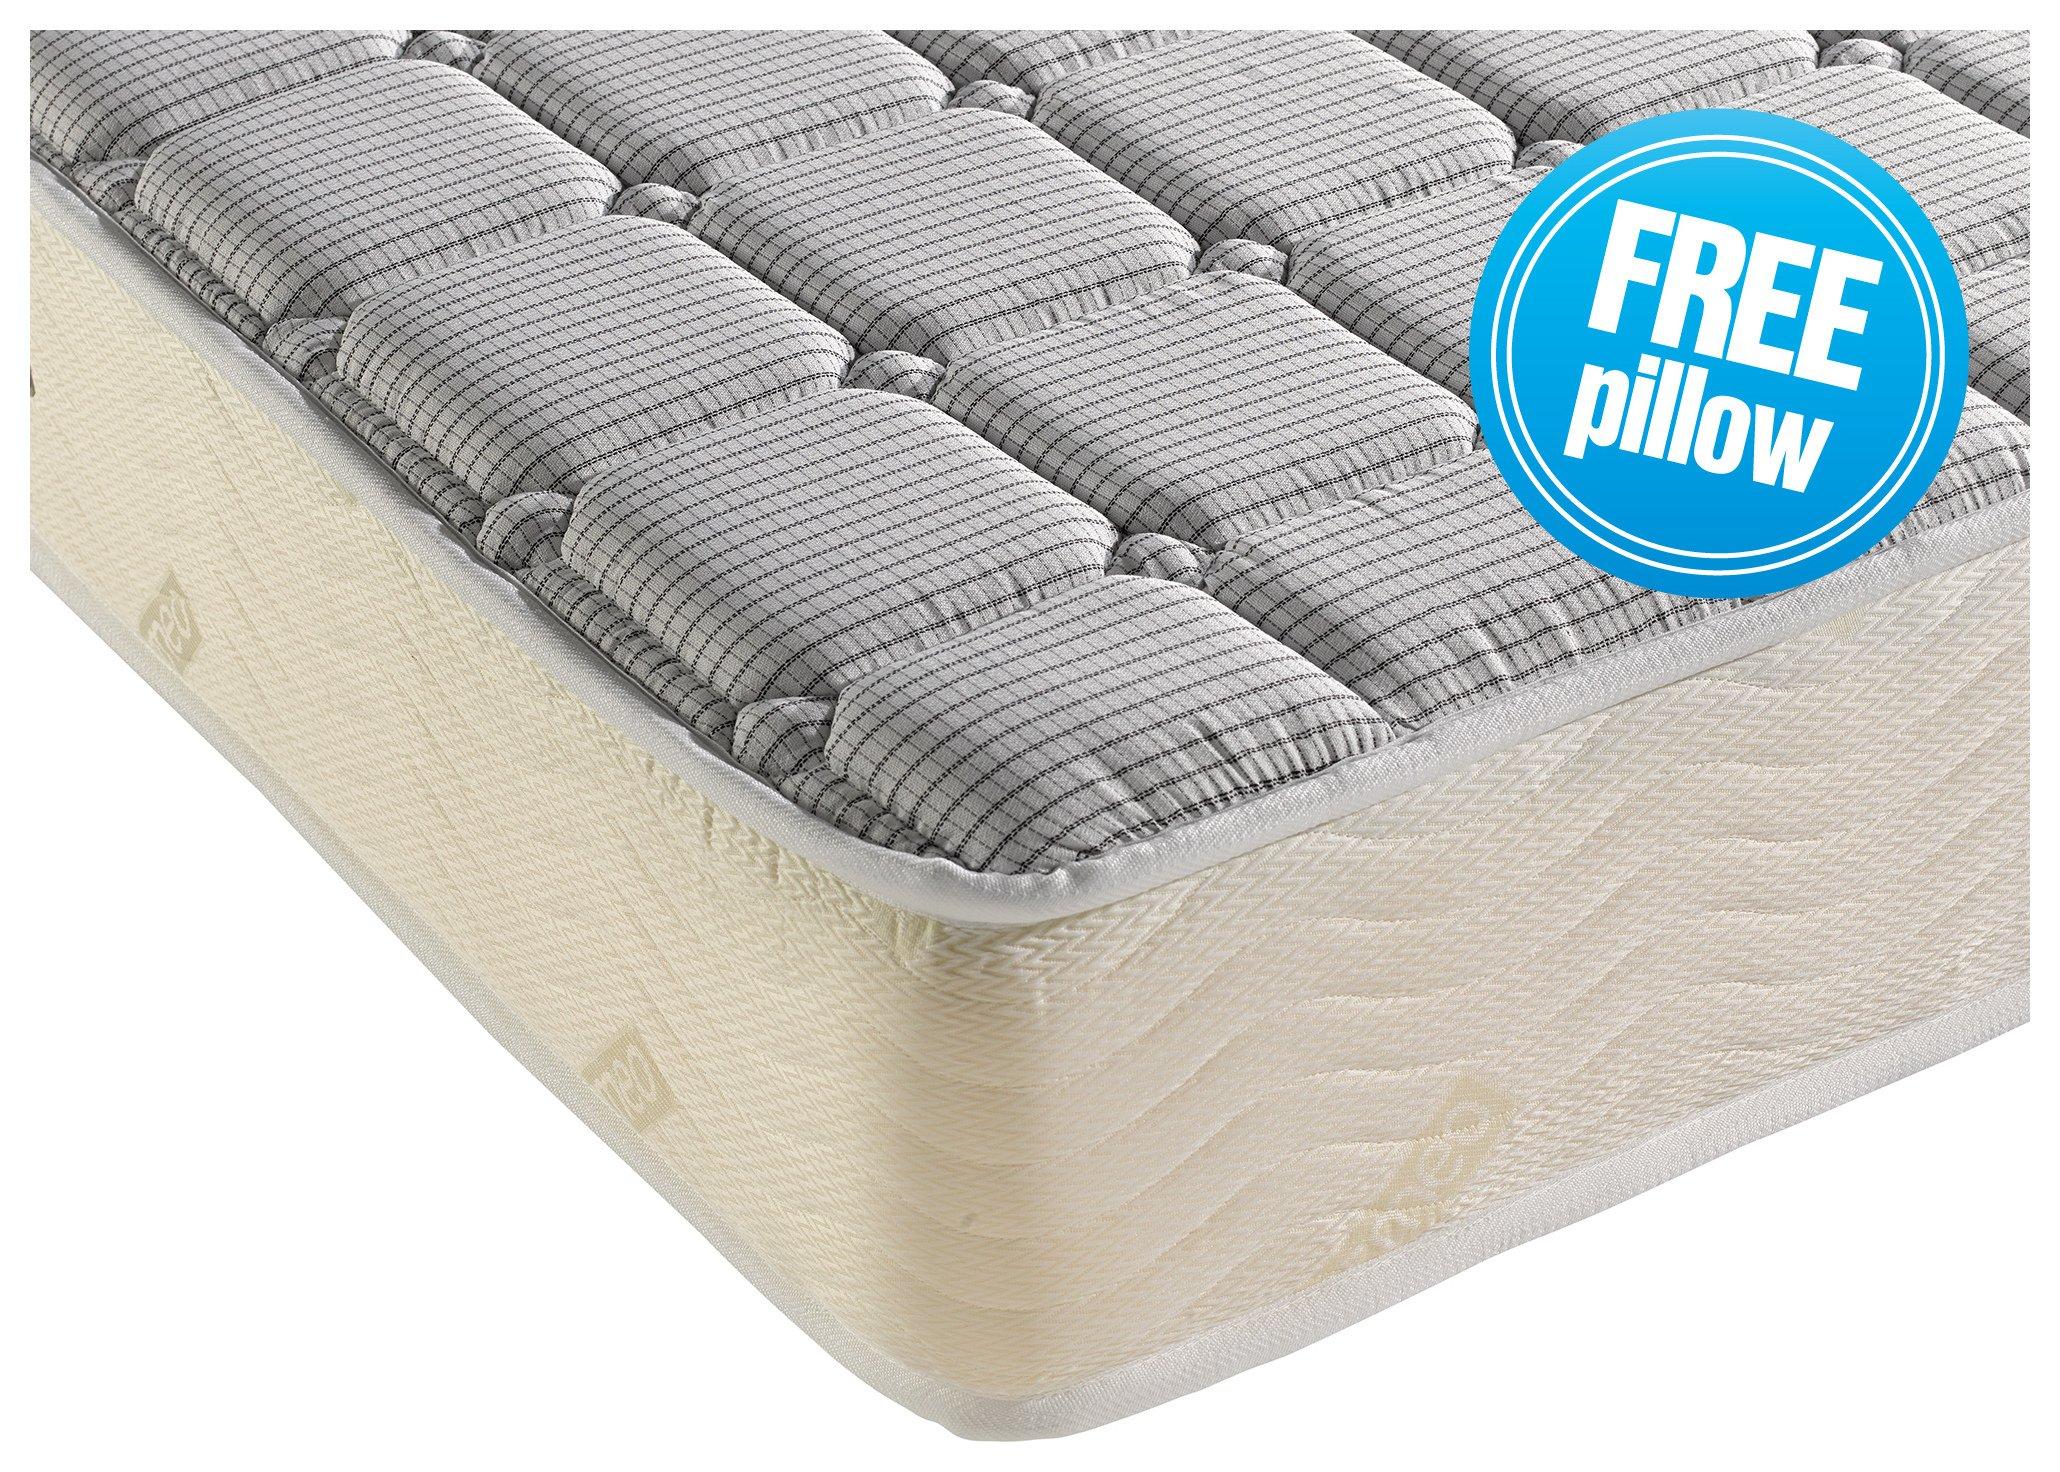 Dormeo Deluxe Memory Foam Double Mattress